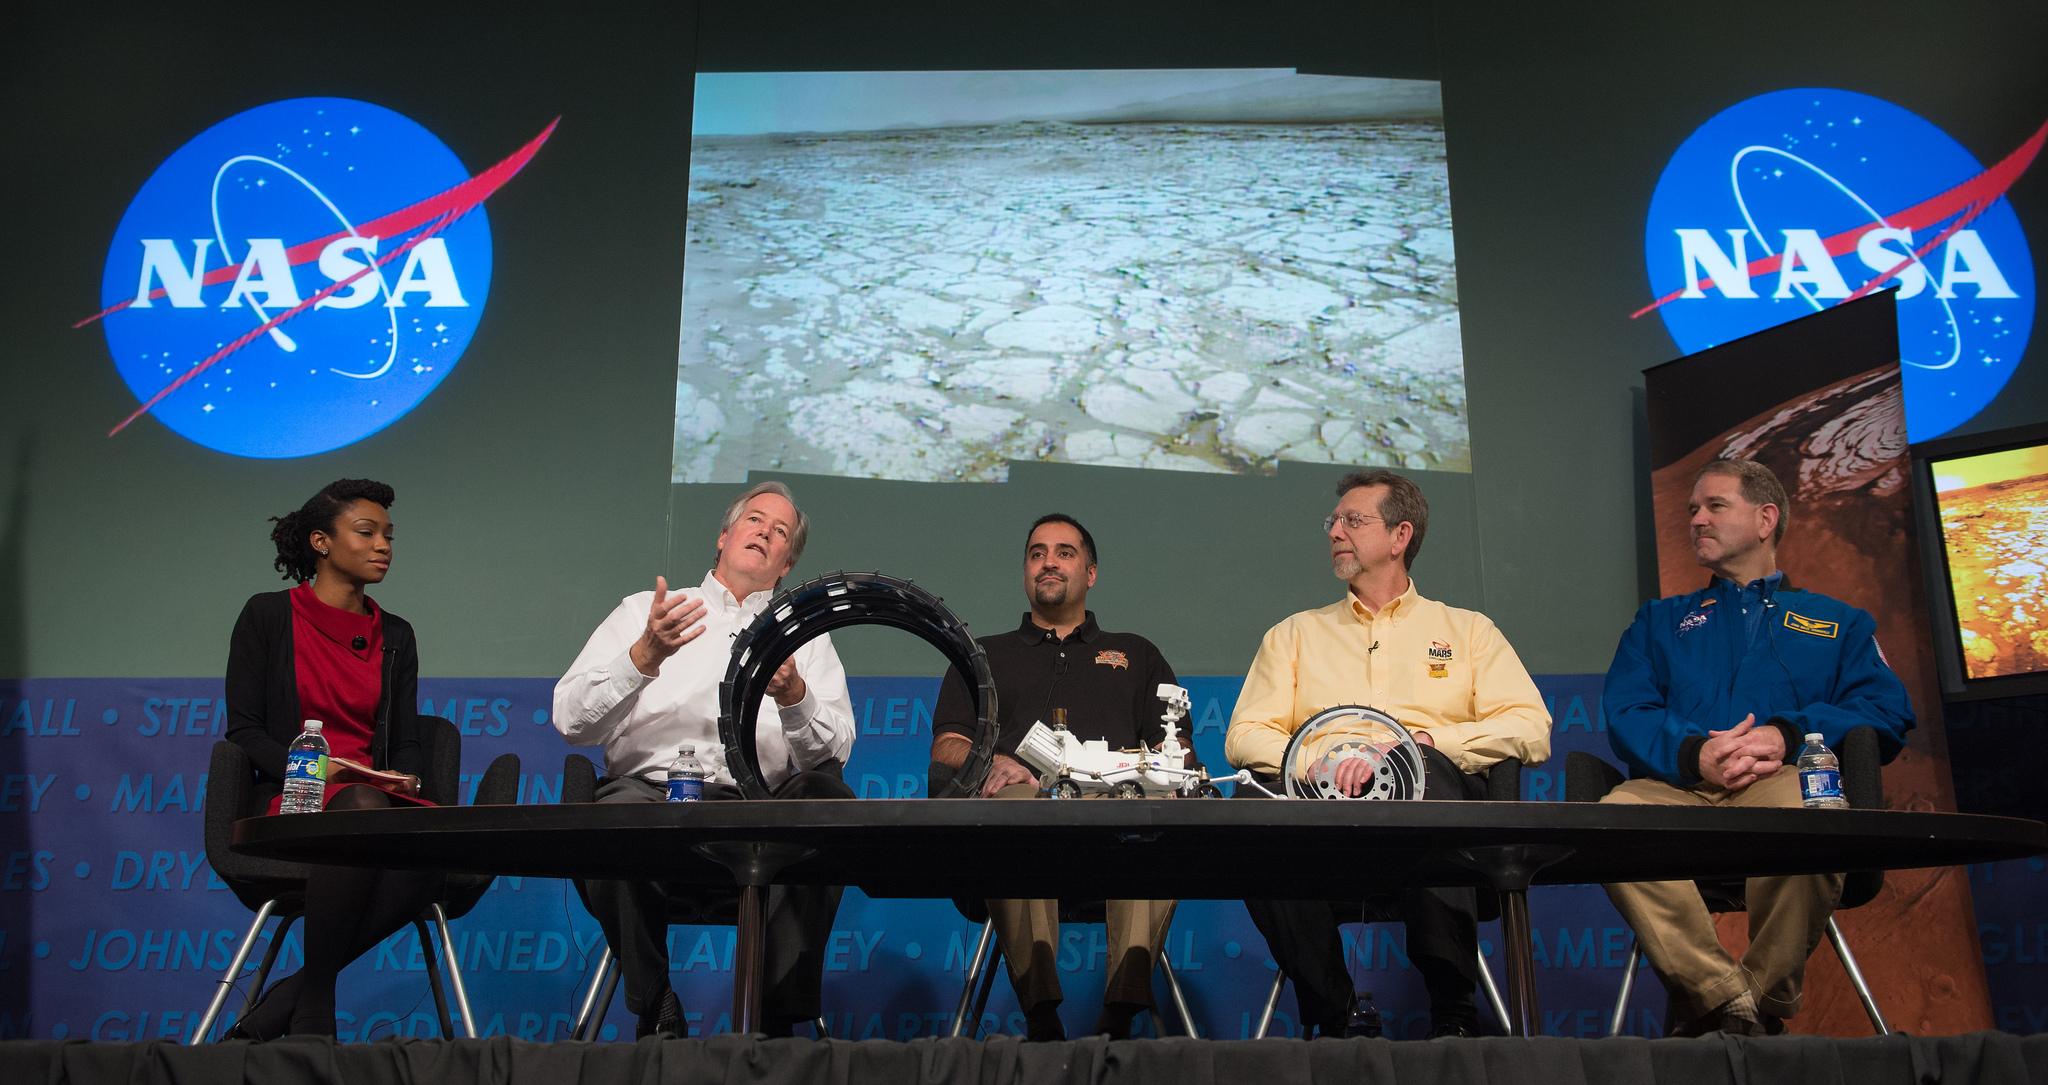 Obama Inauguration 2013: Mars Exploration